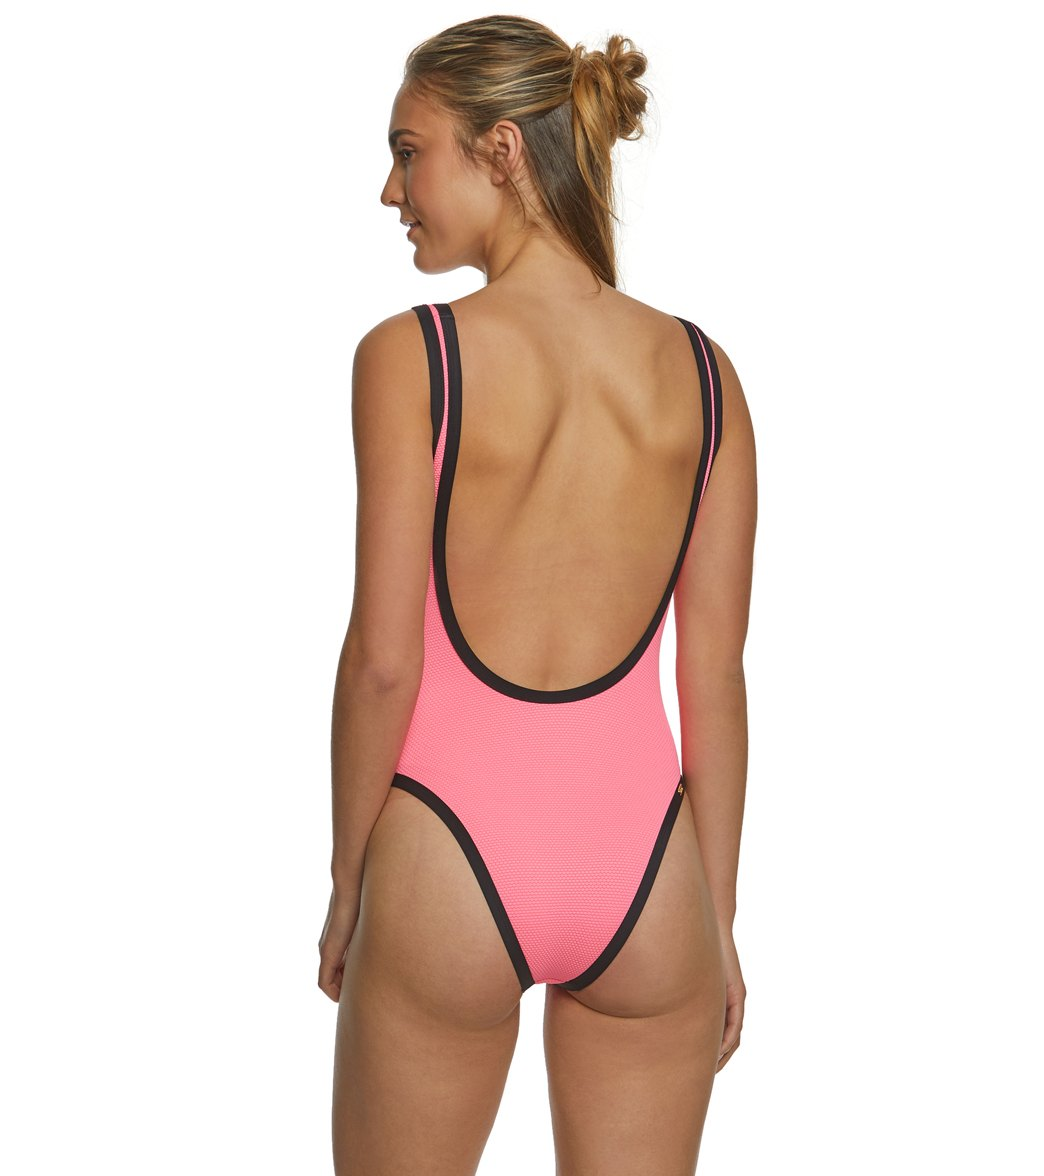 7151ac8b1c Eidon Culebra Jenny Tank One Piece Swimsuit at SwimOutlet.com - Free ...